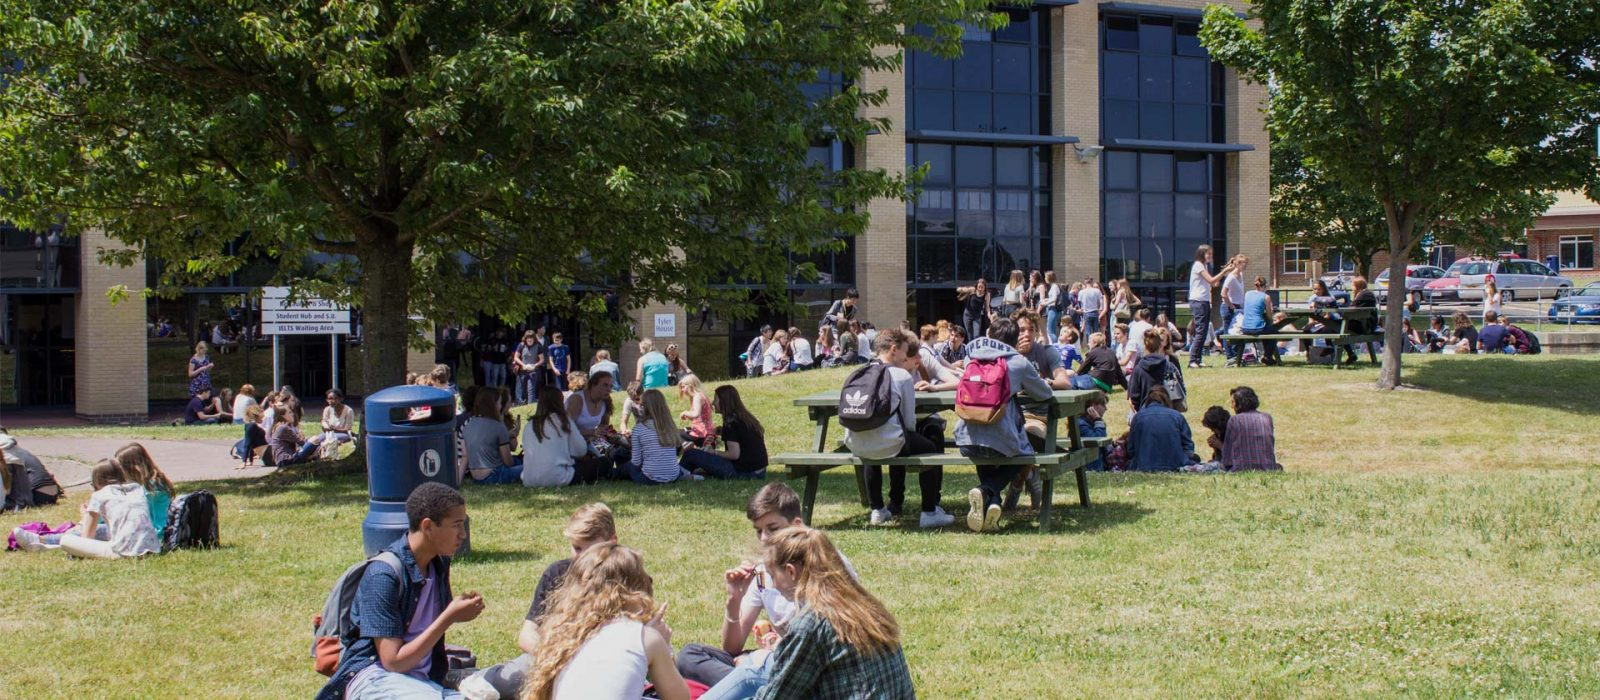 eastbourne-campus-shot-1-1